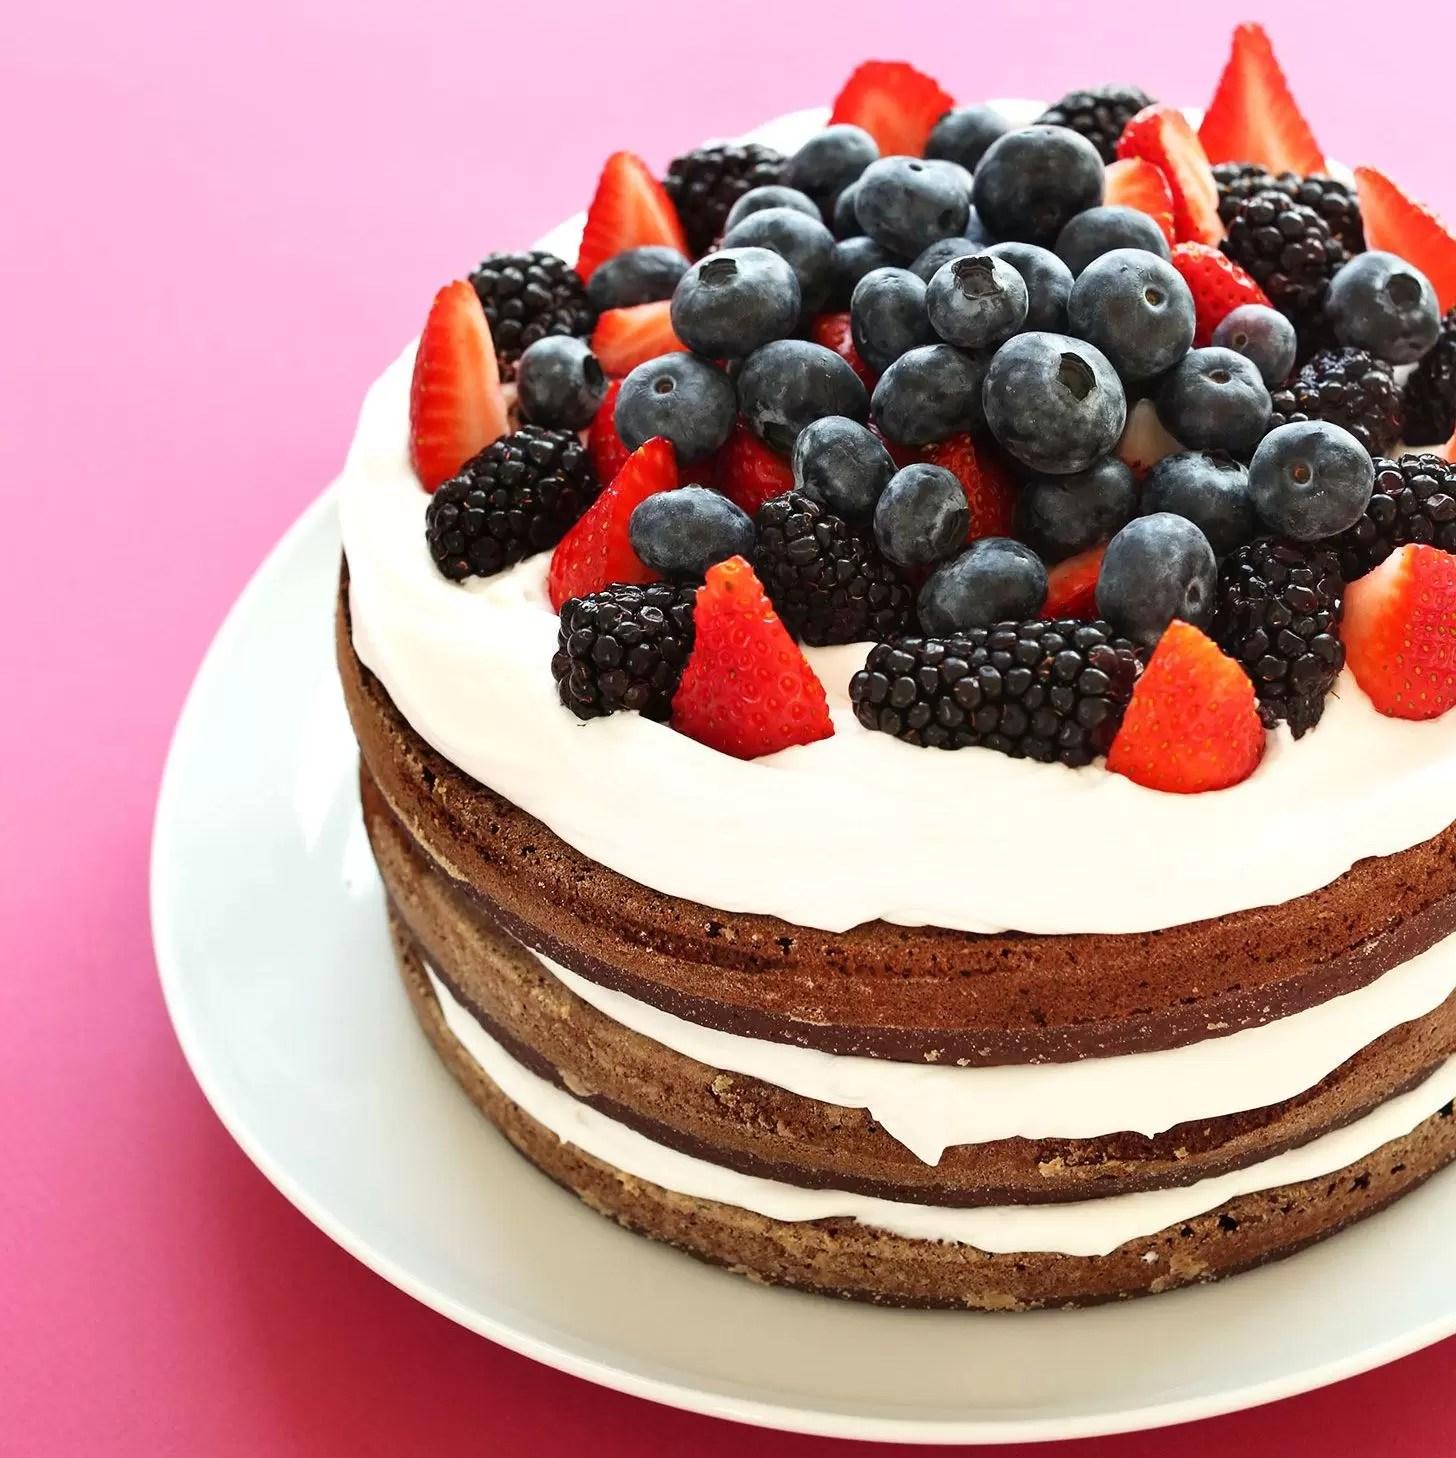 Sugar Free Cake Recipes Yummy Birthday Cakes That Are